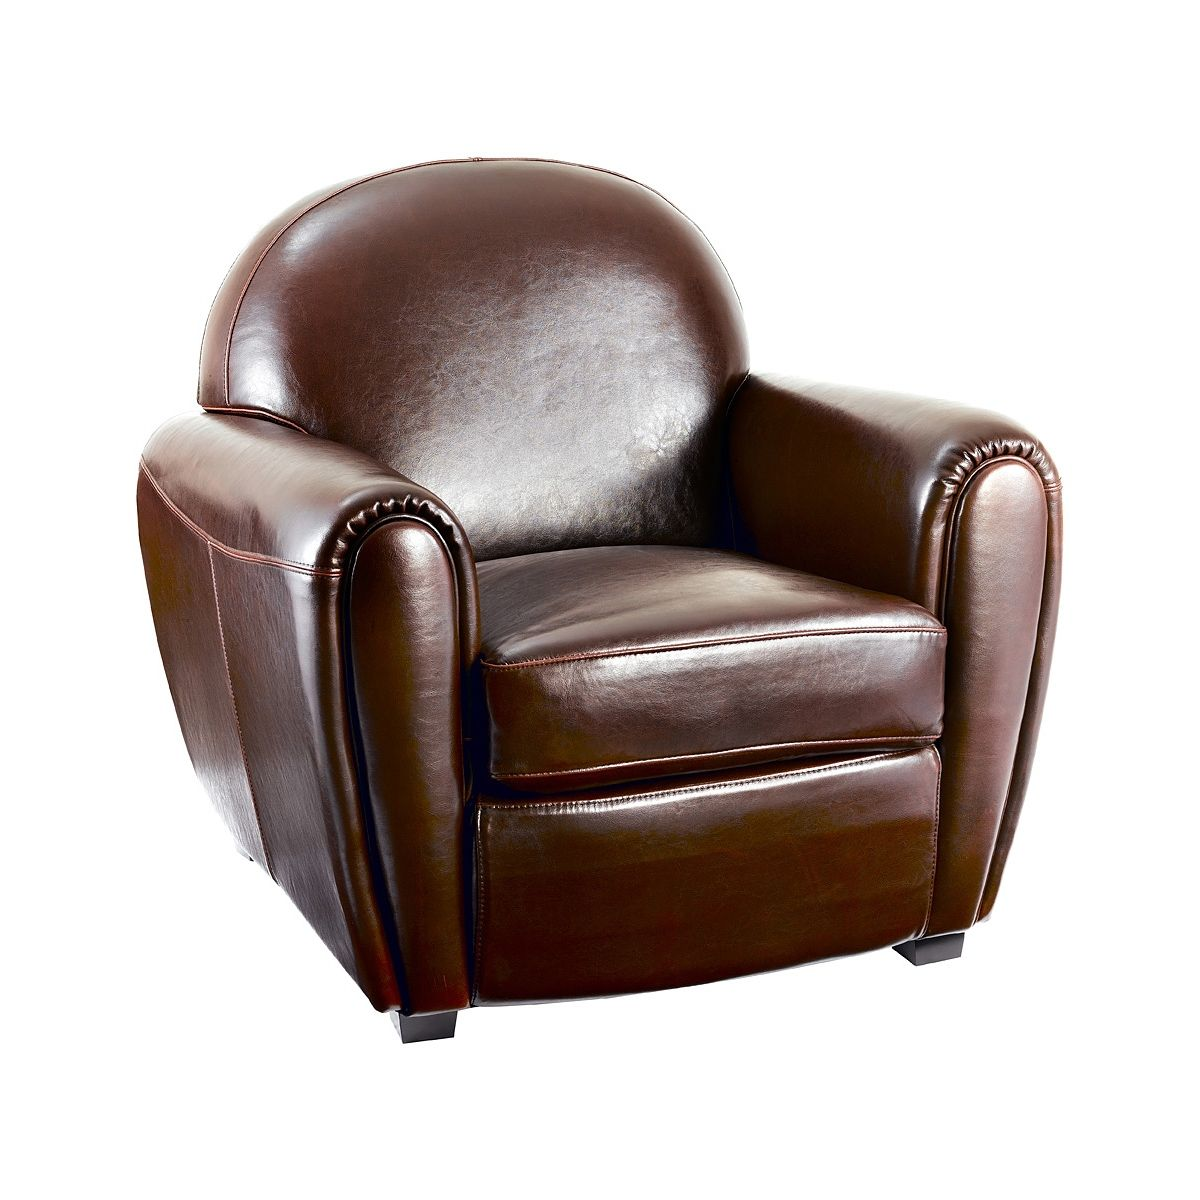 beautiful fauteuil club marron en crote de cuir maya with bureau style anglais. Black Bedroom Furniture Sets. Home Design Ideas